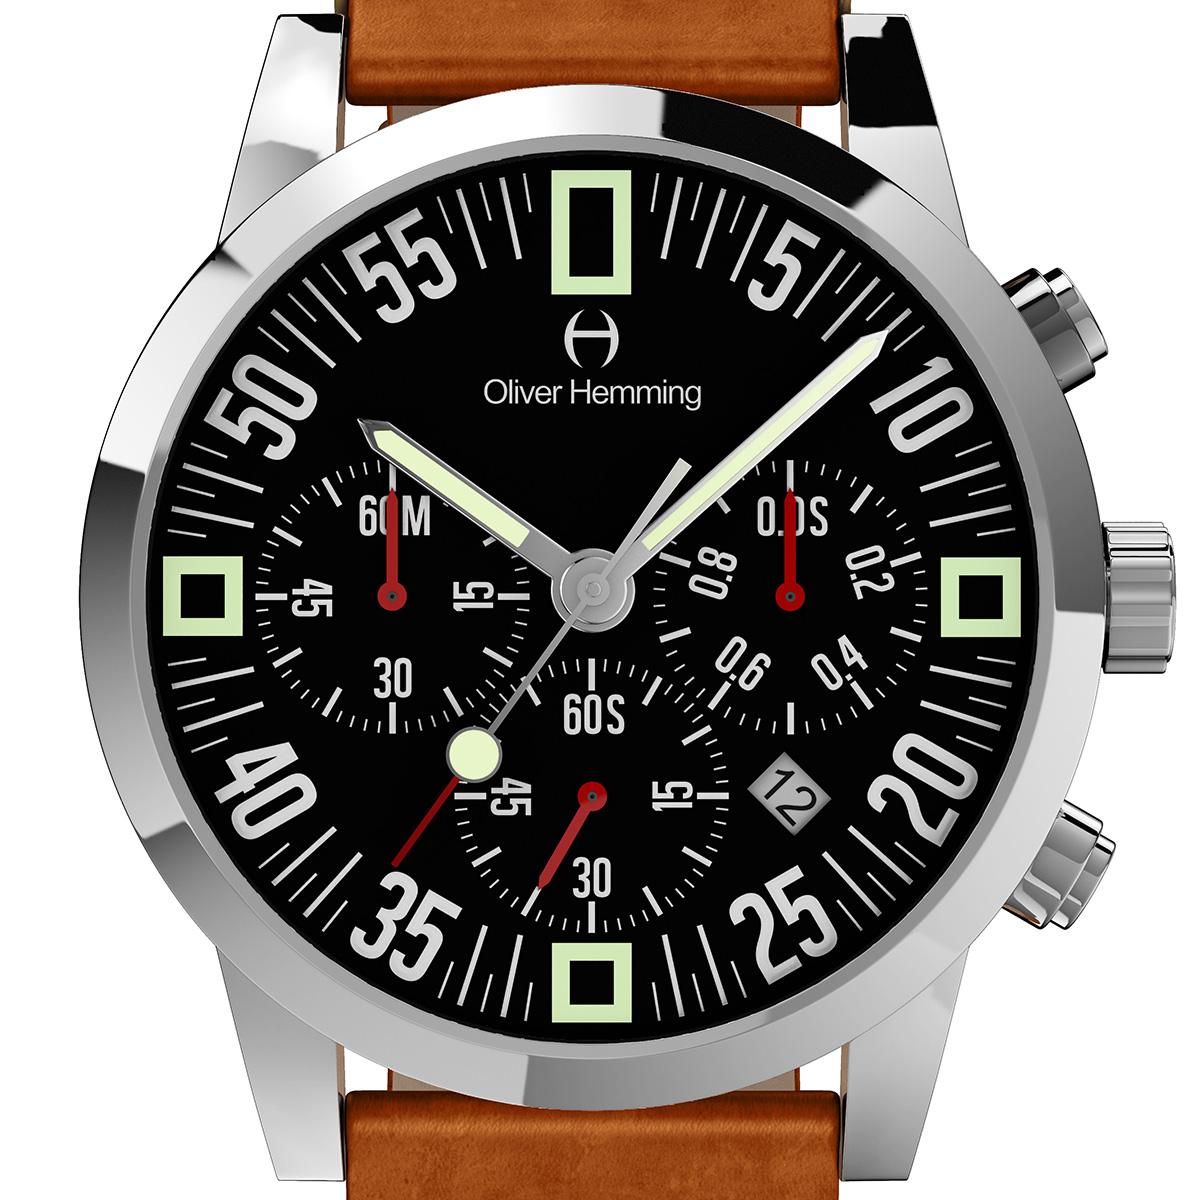 Oliver Hemming オリバーヘミング クォーツ 腕時計 イギリス アート デザイン [WTC17S80BVT] 正規代理店品 純正ケース メーカー保証